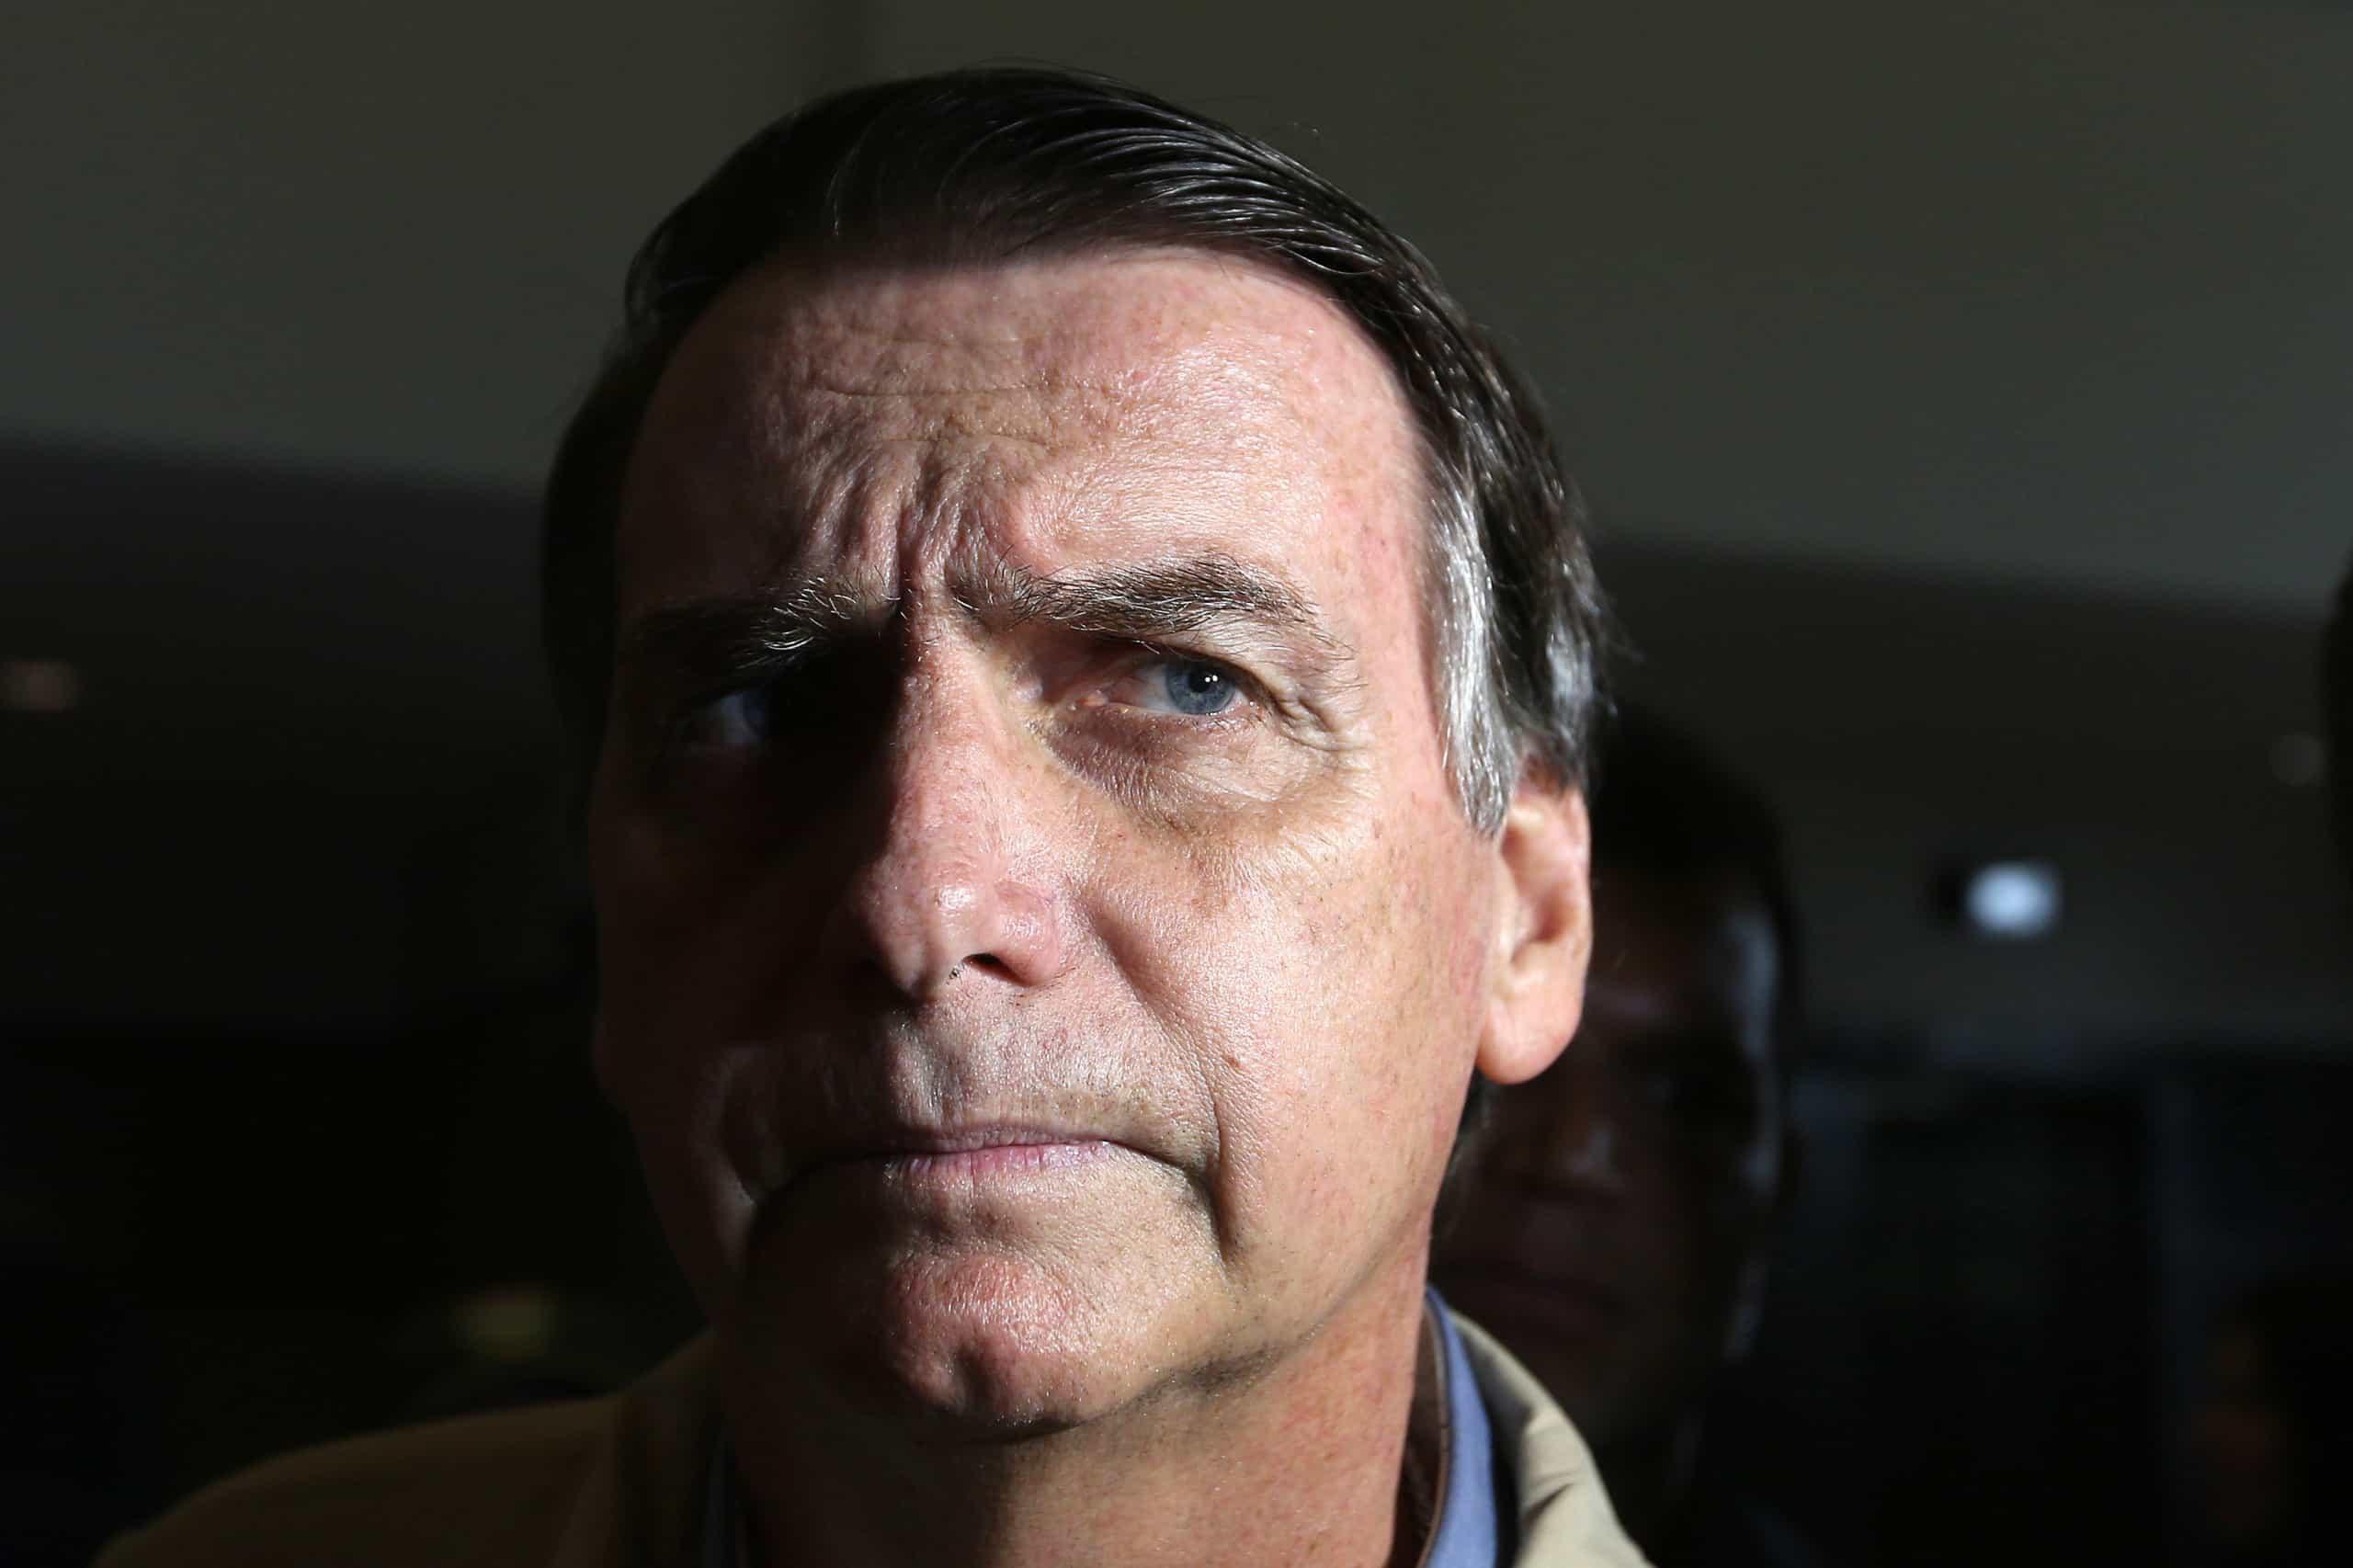 Candidatura de Bolsonaro pode ser impugnada se for provado financiamento